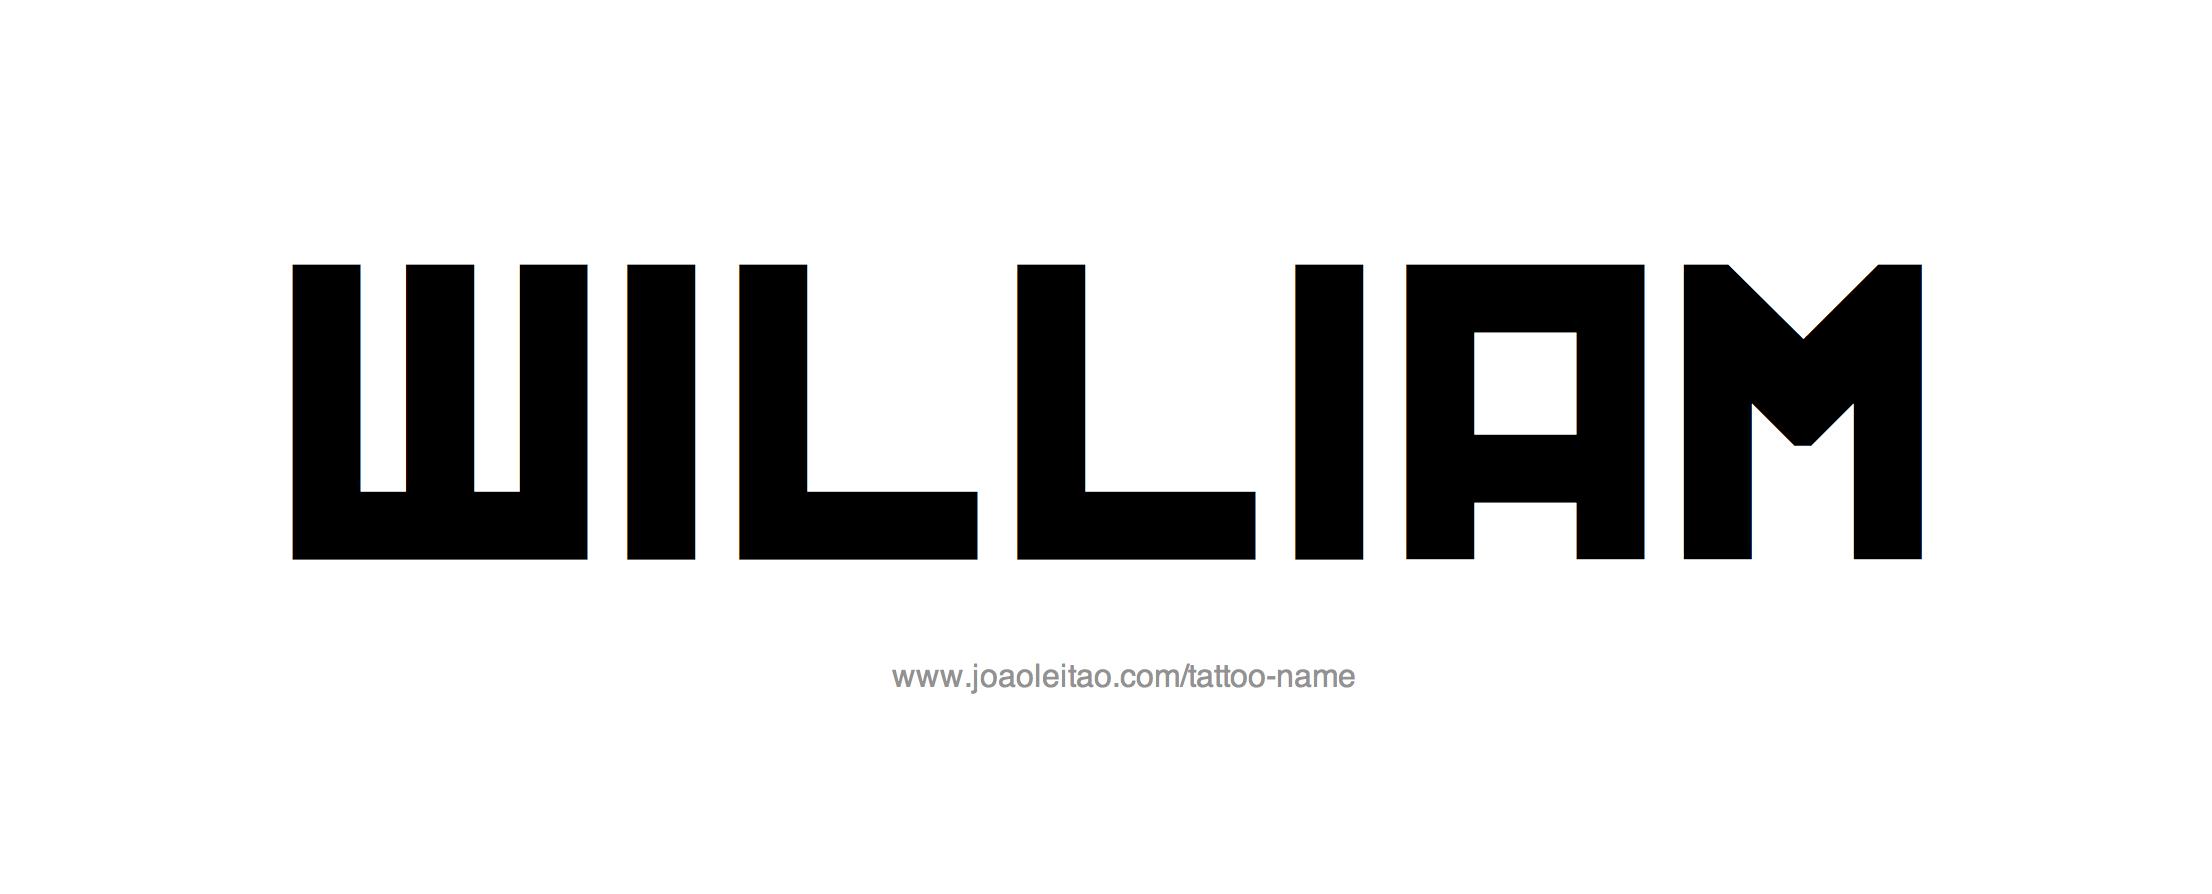 Name: William Name Tattoo Designs